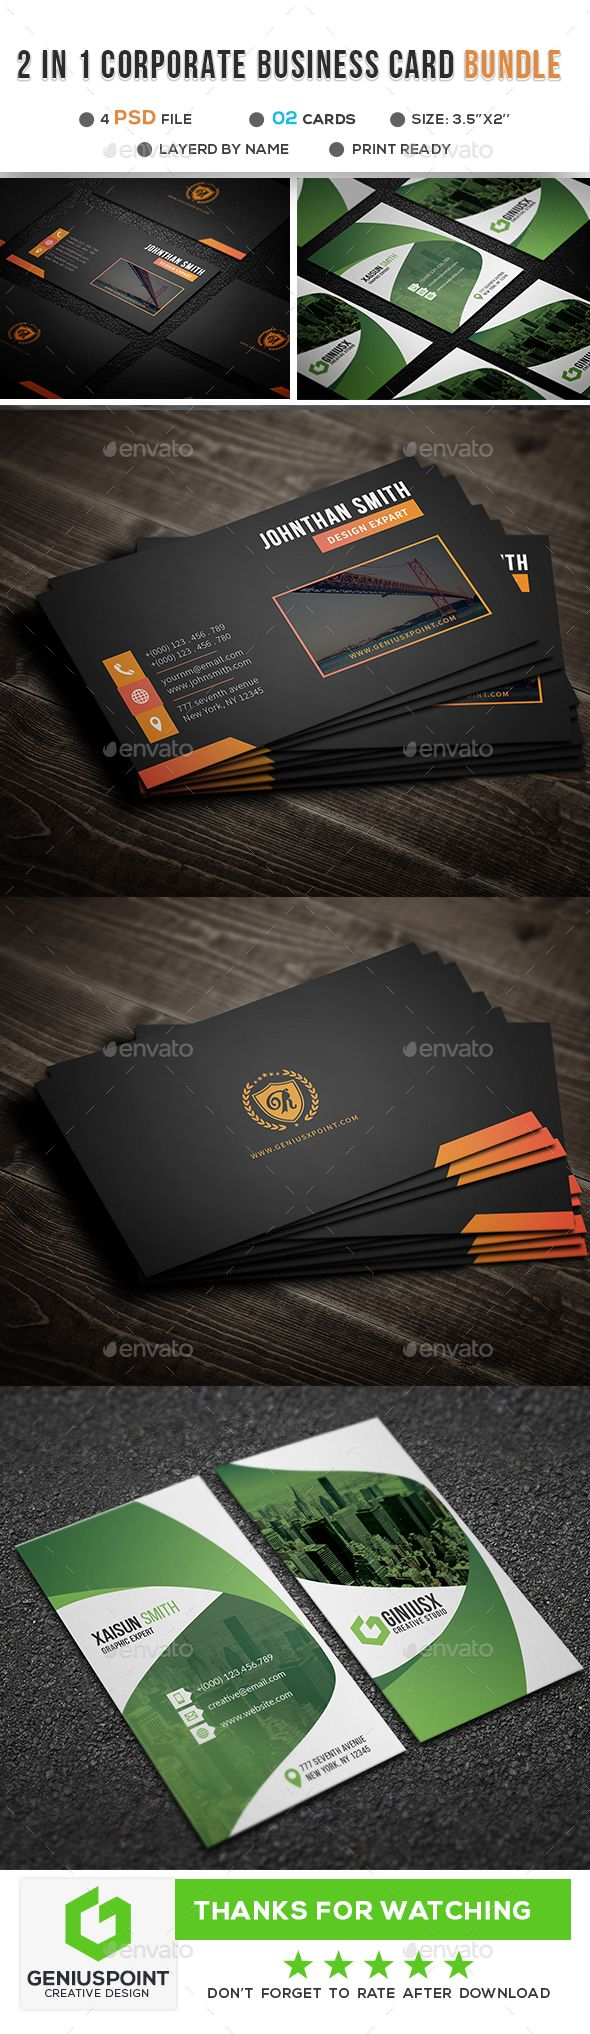 Business Card Bundle Printing Business Cards Business Card Template Psd Buy Business Cards